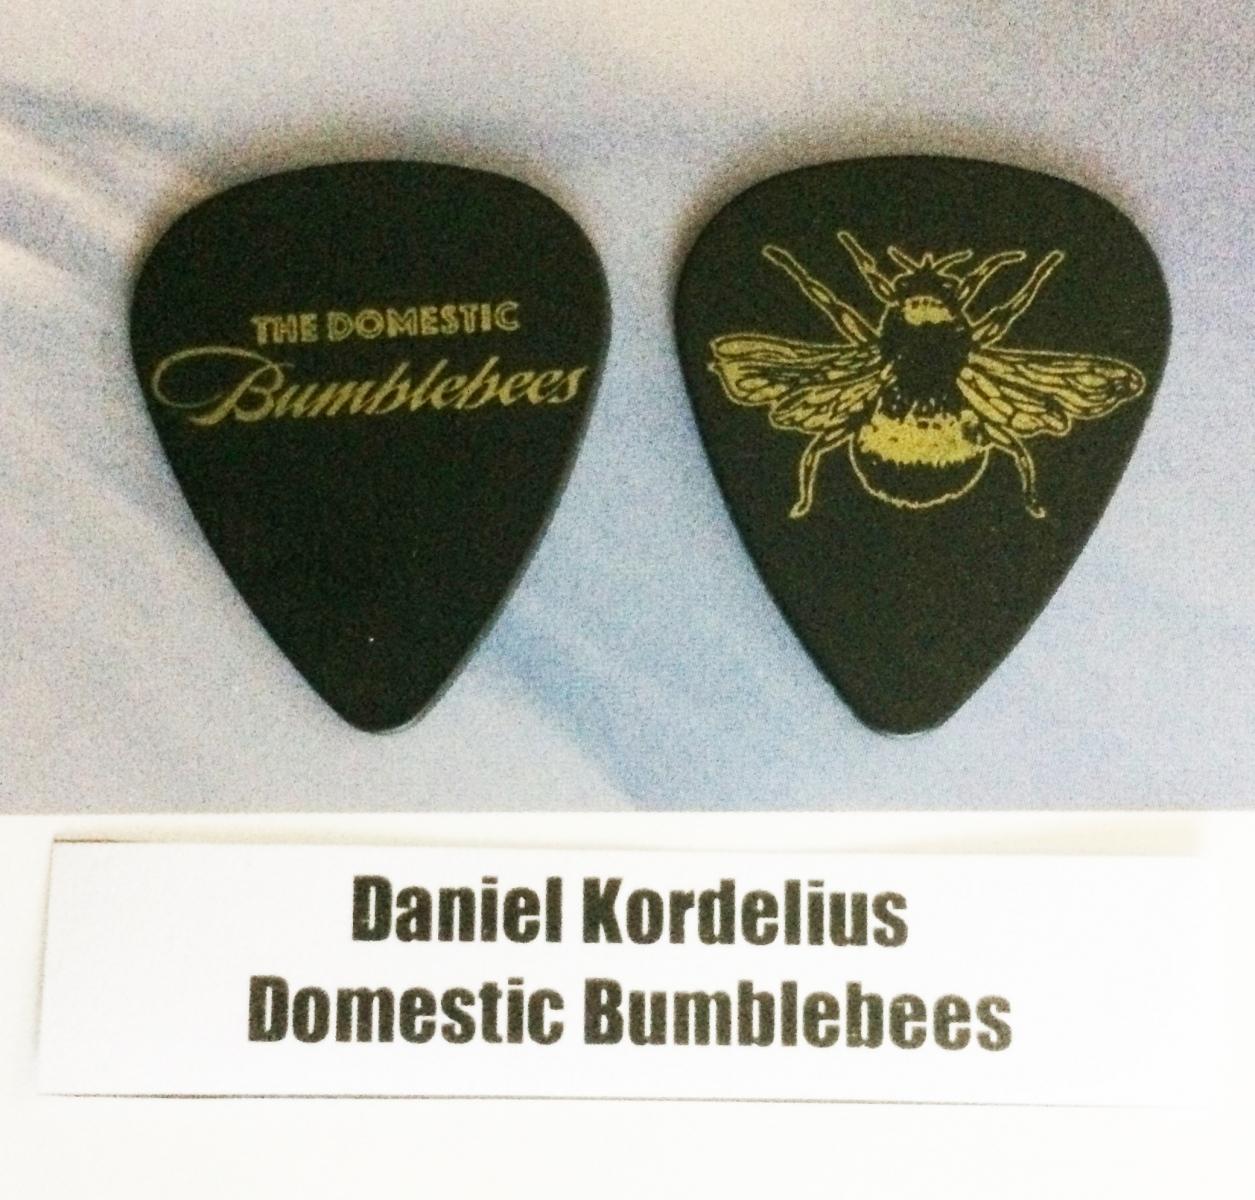 Daniel Kordelius